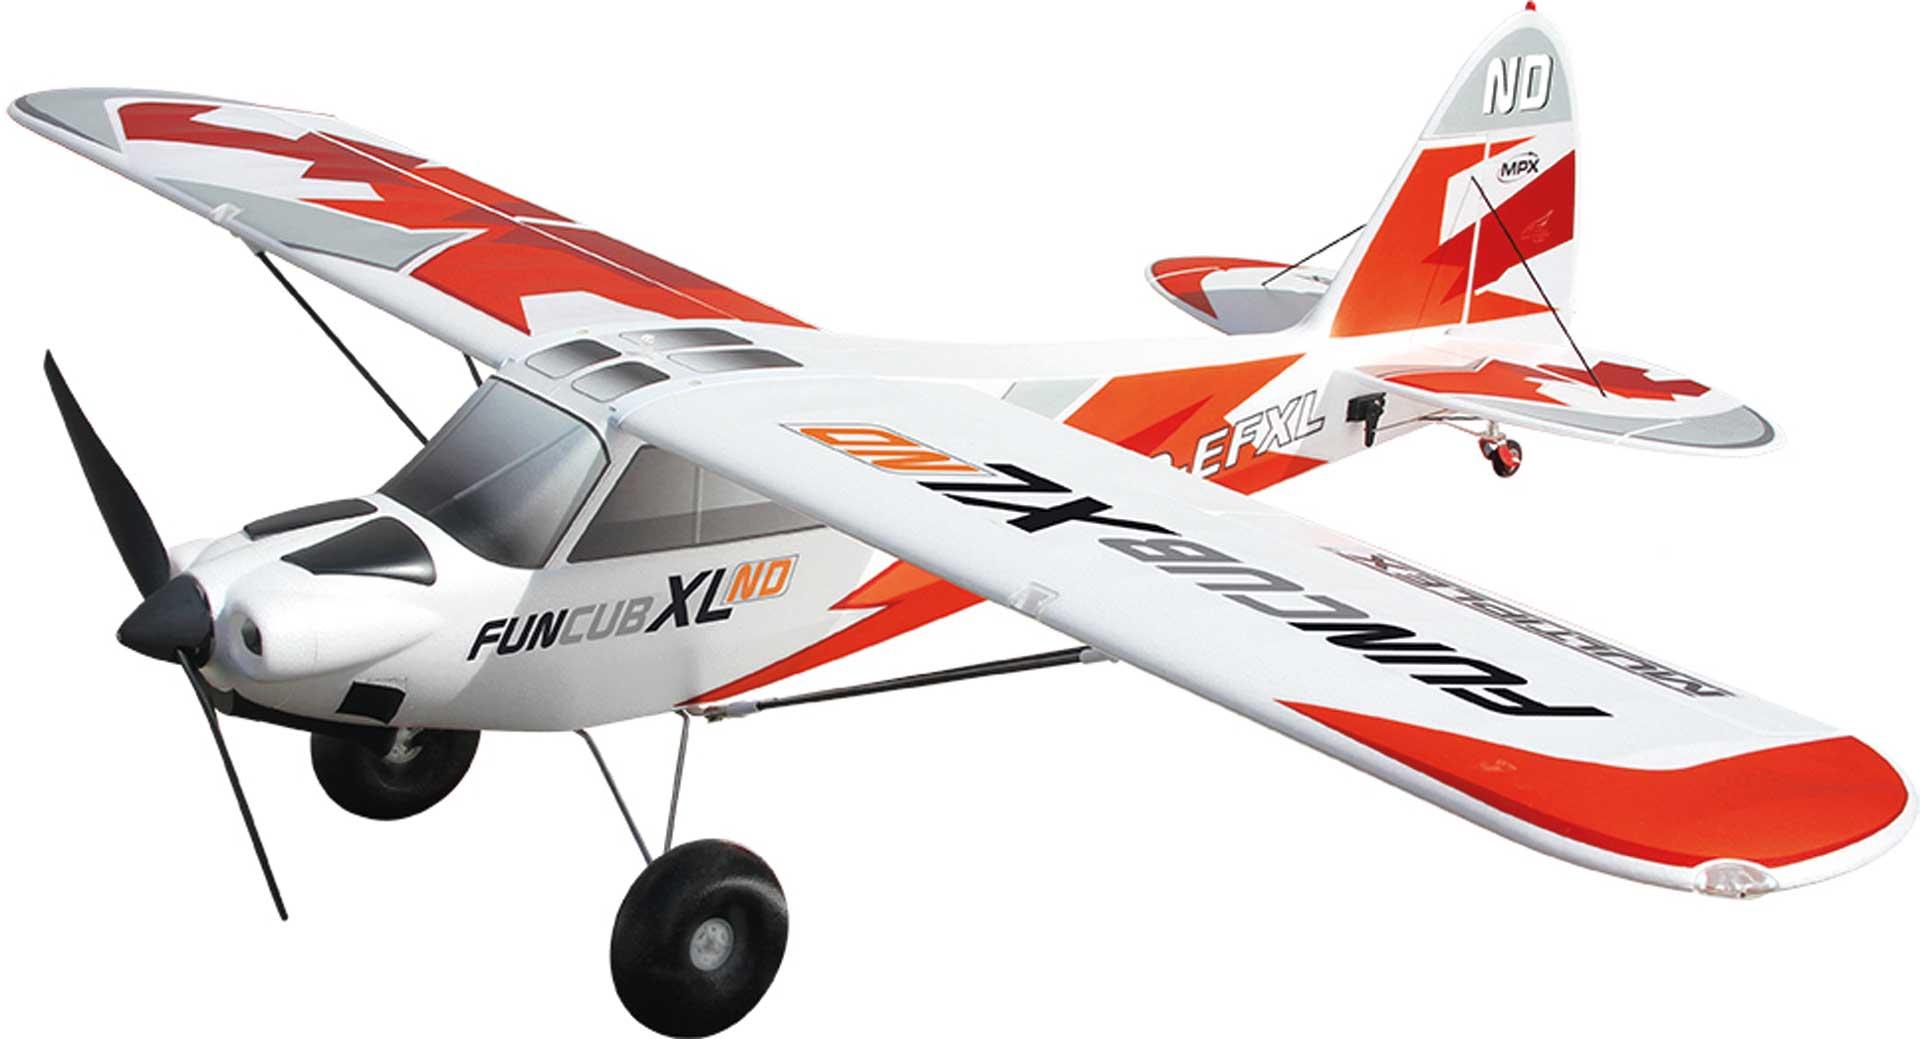 MULTIPLEX RR FunCub XL ND inkl. Antriebsset und Servos